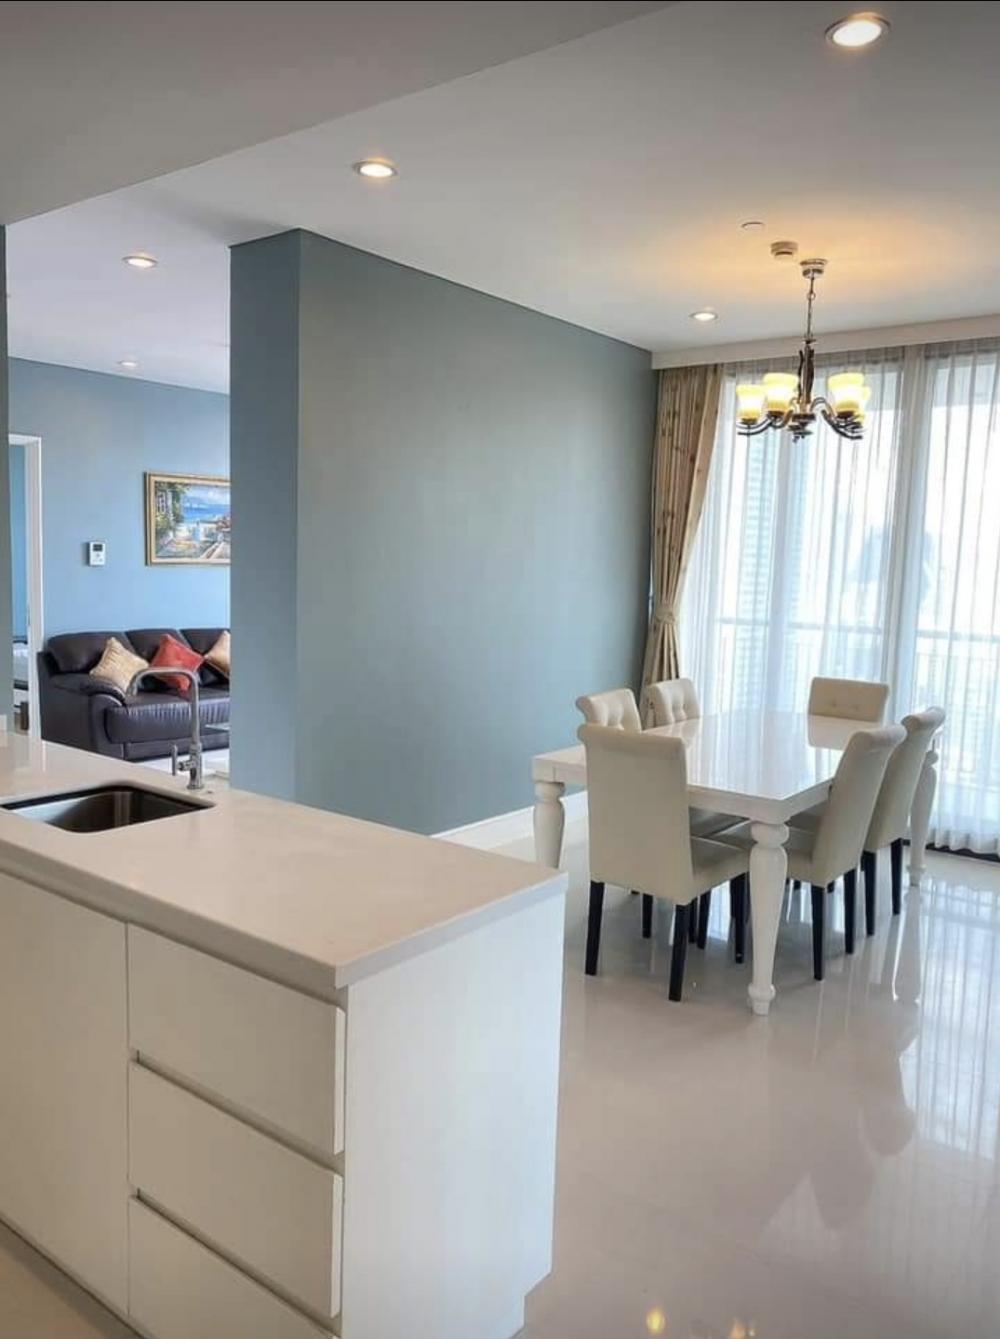 For RentCondoSukhumvit, Asoke, Thonglor : For rent Auguston Sukhumvit 22, 155 Sqm, 25th floor, Building B., 3 bedrooms + 1 maid's room, 4 bathrooms + 1 maid's bathroom, 2 kitchens (Thai, Europe) - can pet